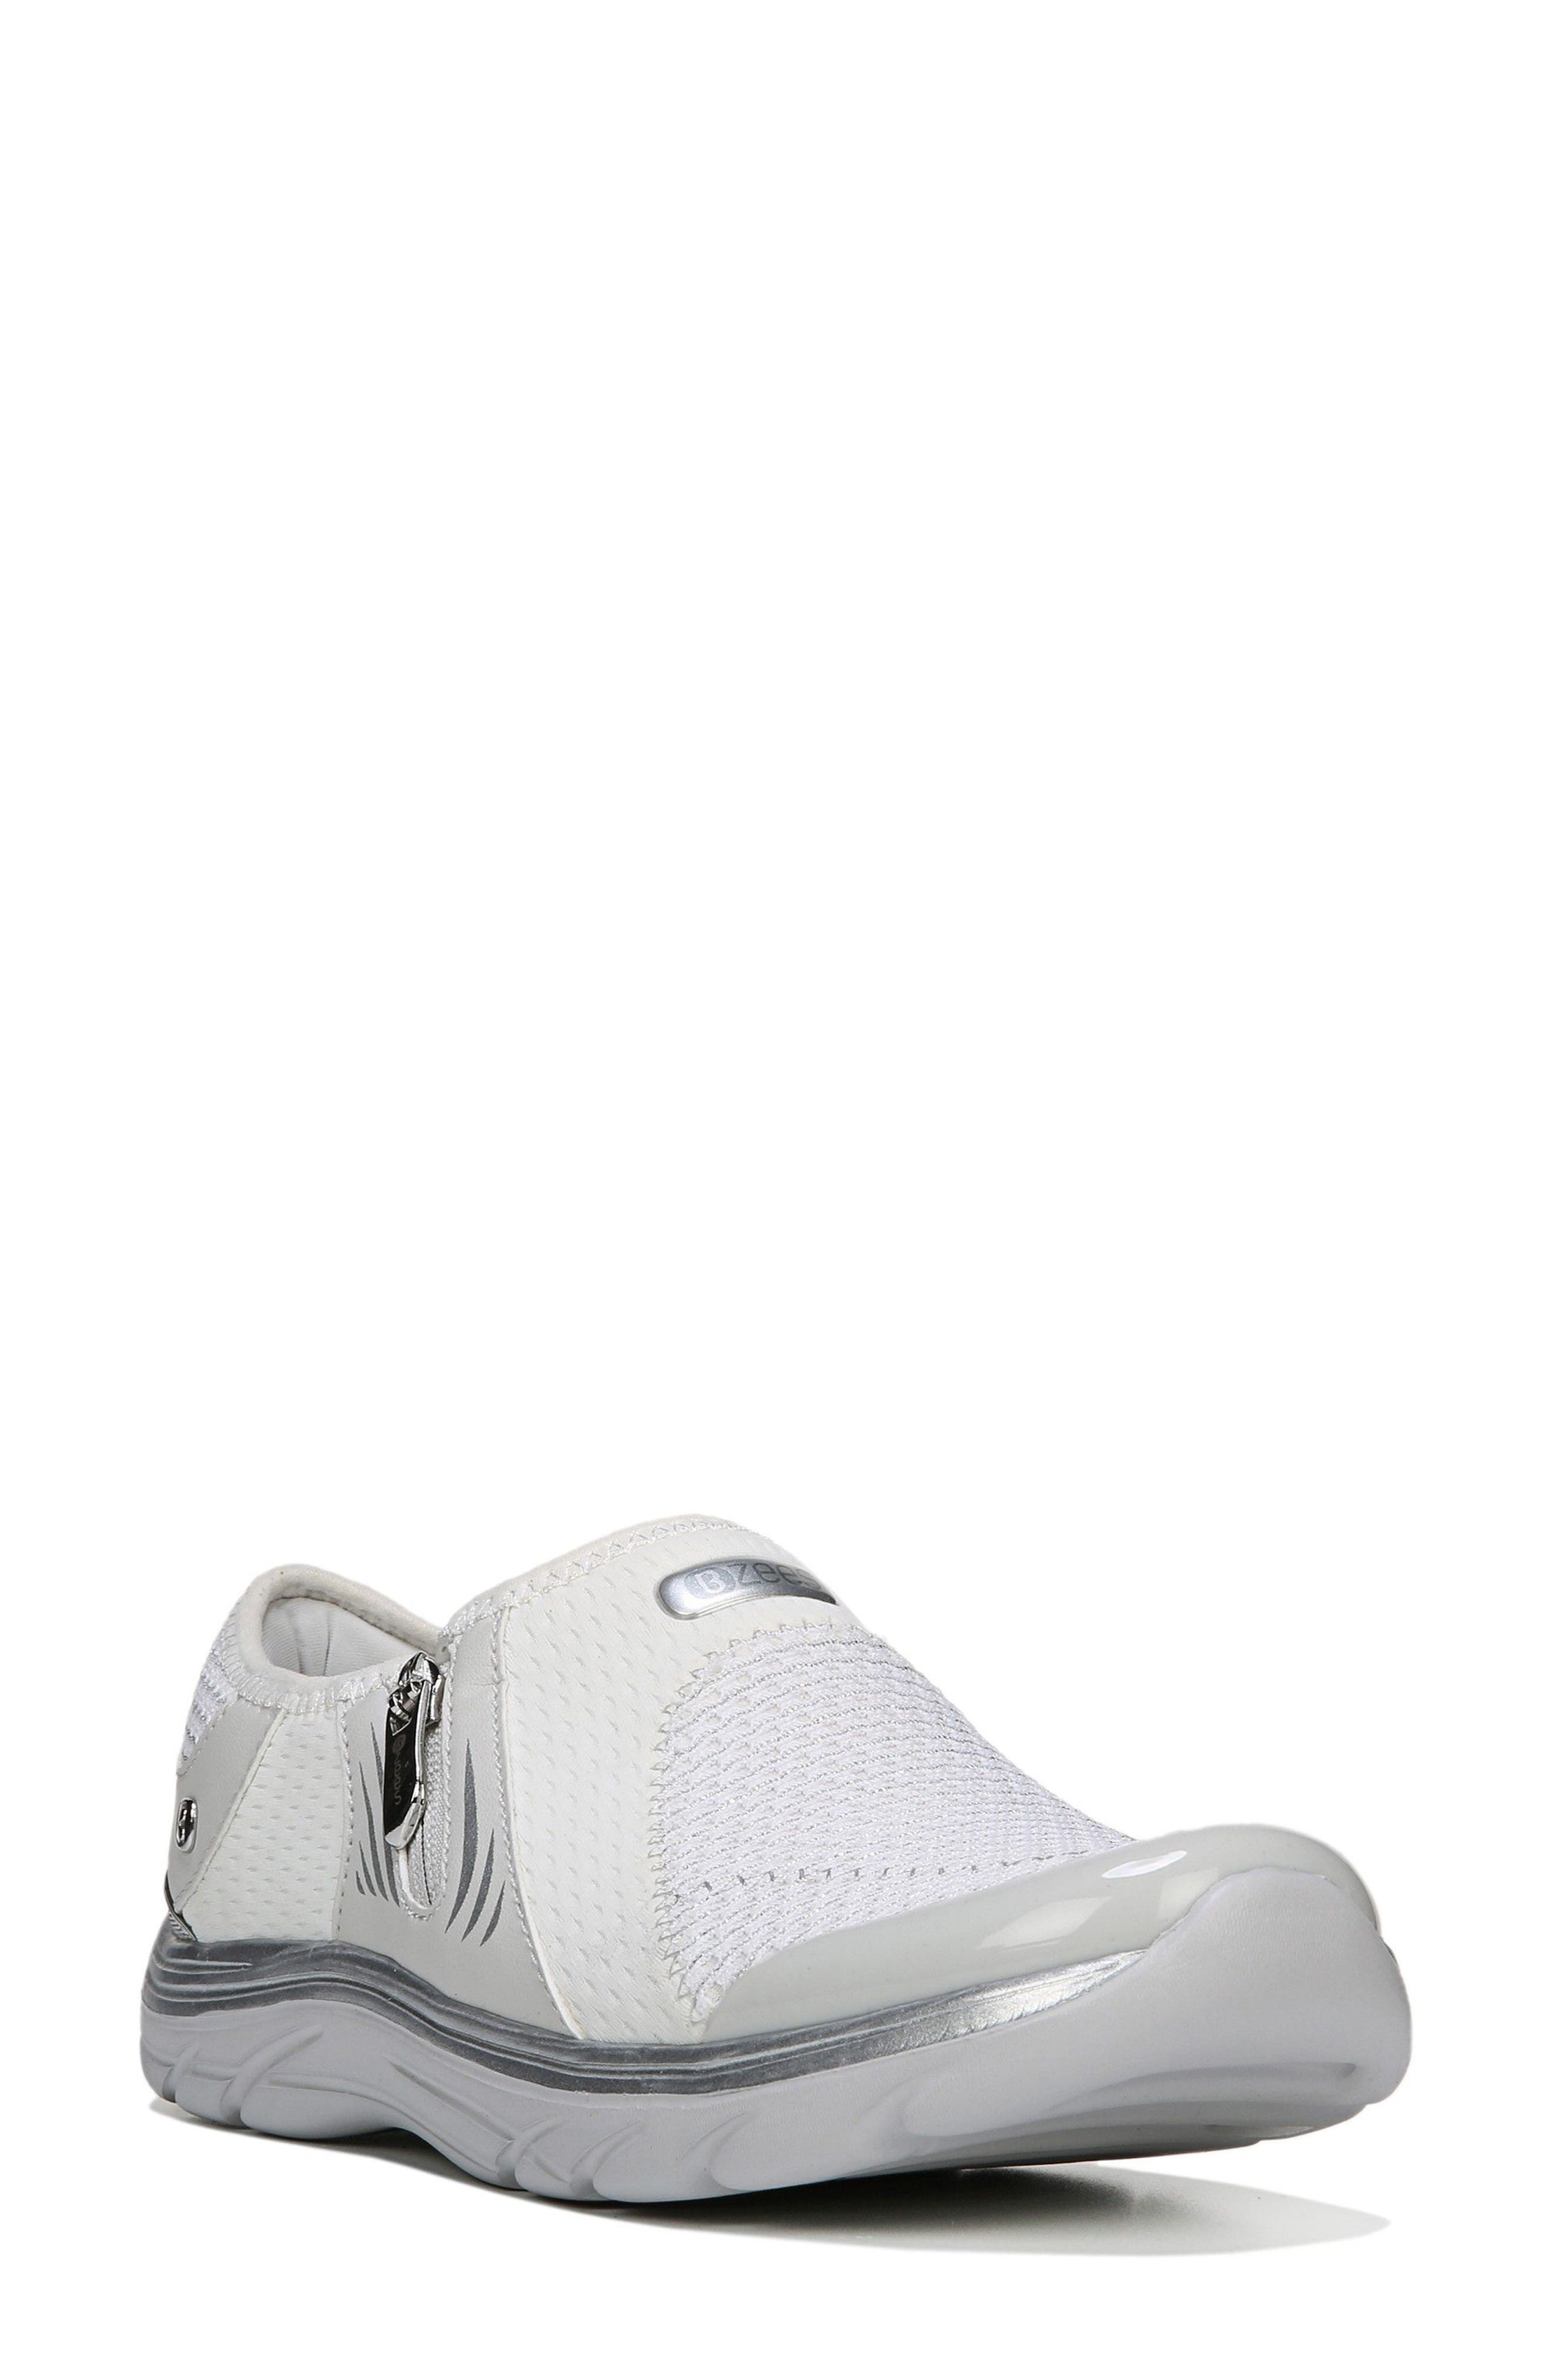 Balance Sneaker,                             Main thumbnail 2, color,